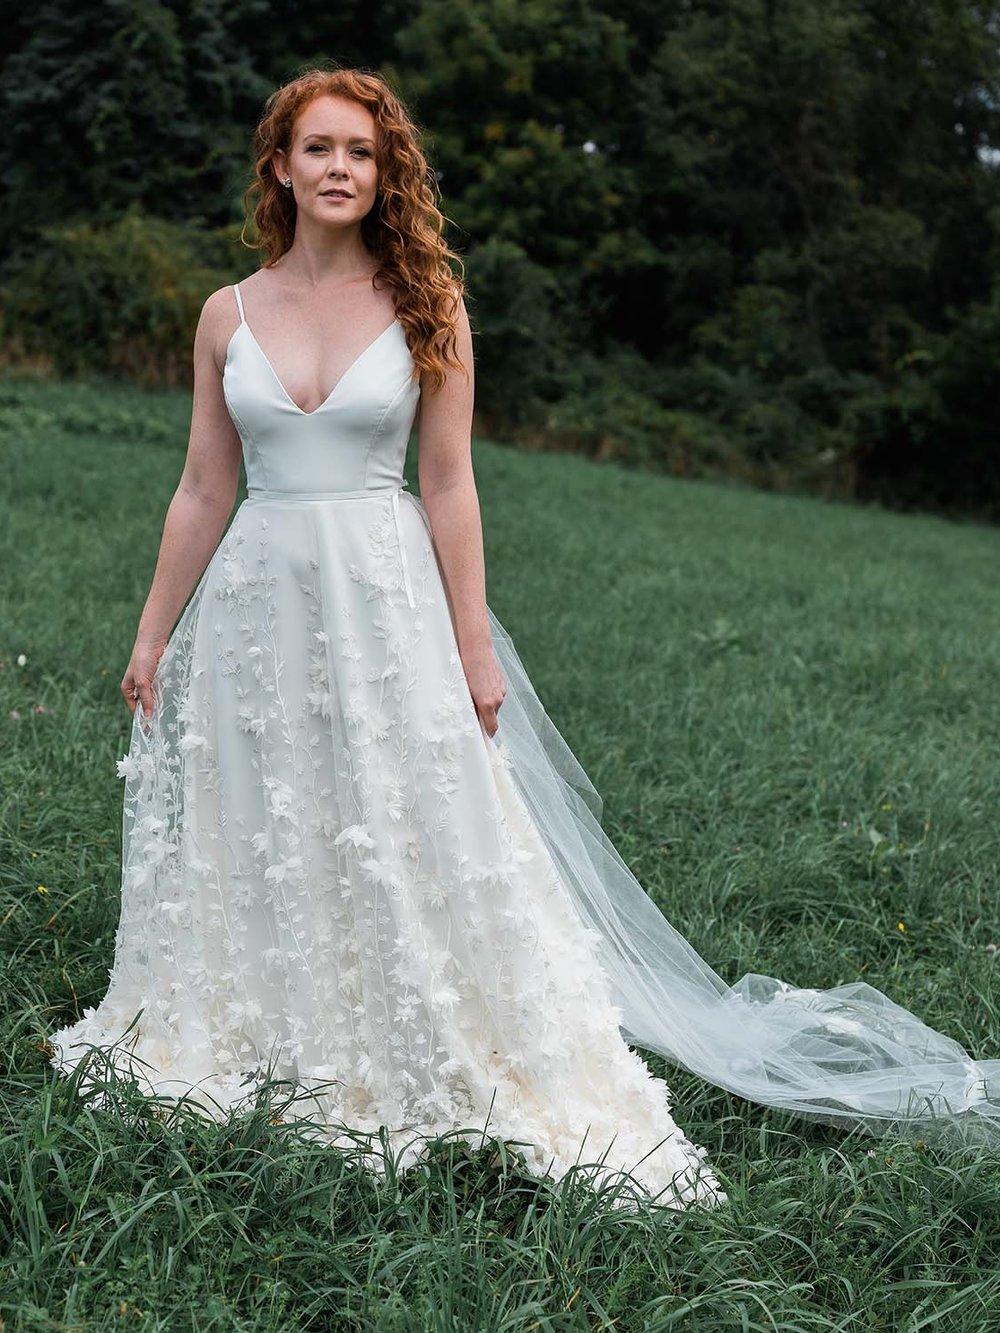 rebecca_schoneveld_reid_gown_romantic_boho_ivory_4.jpg